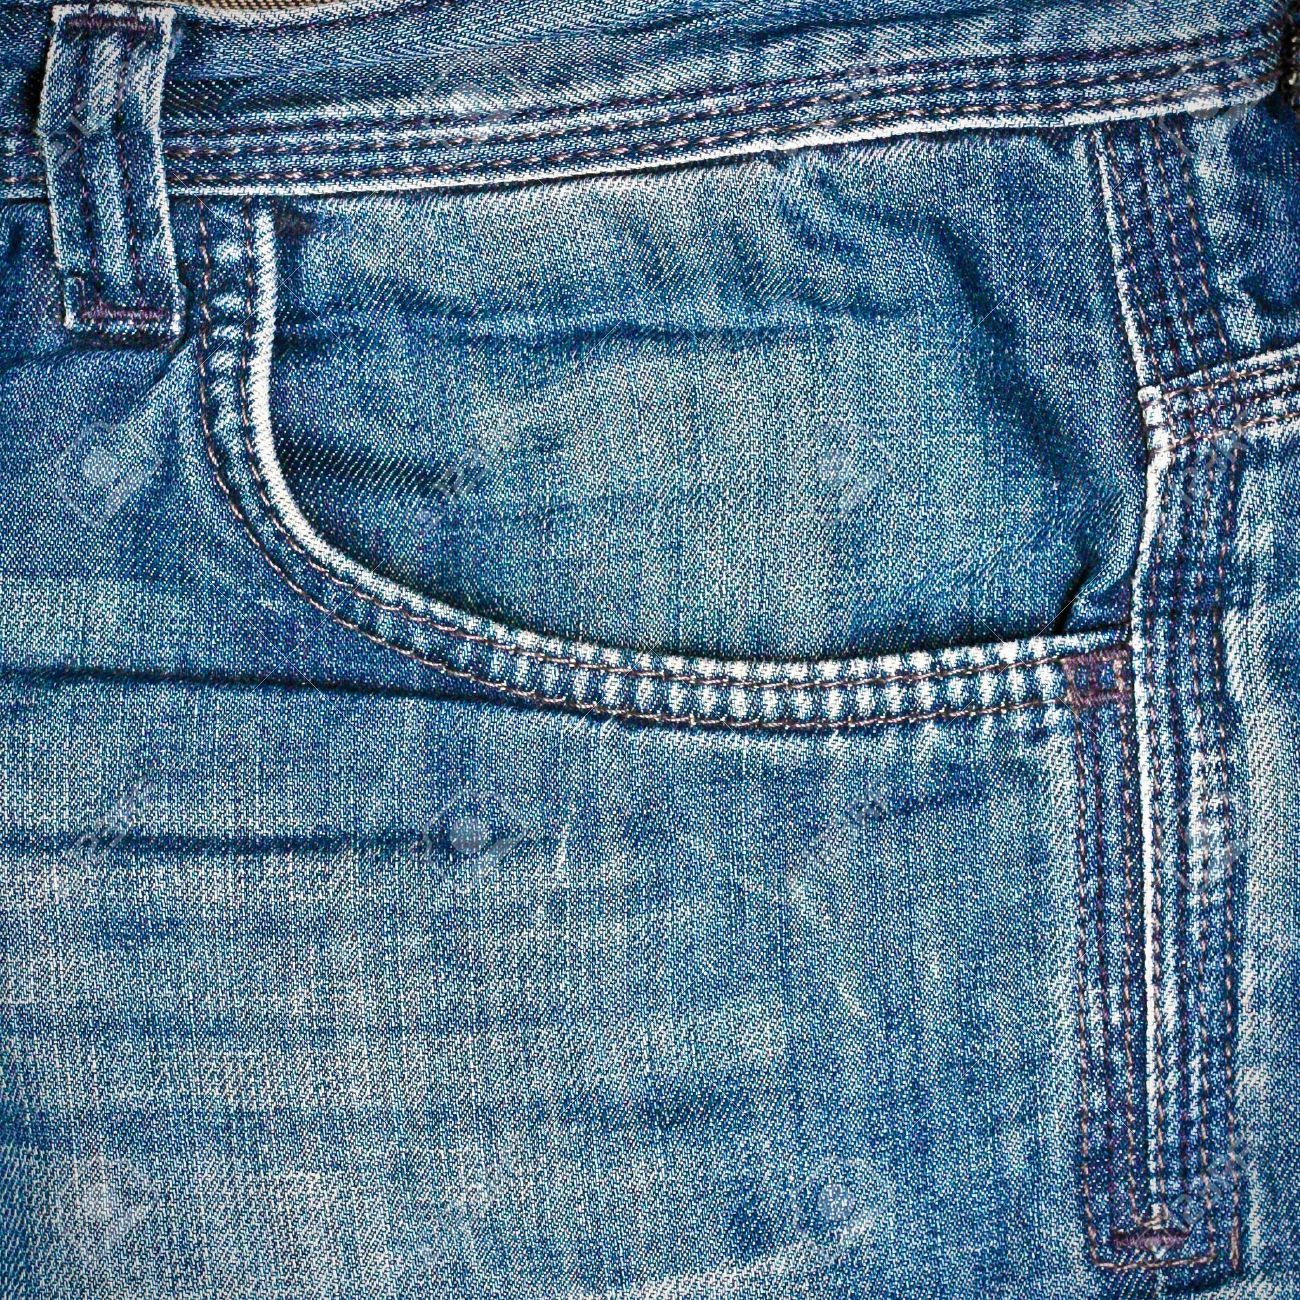 blue jeans pocket wwwpixsharkcom images galleries